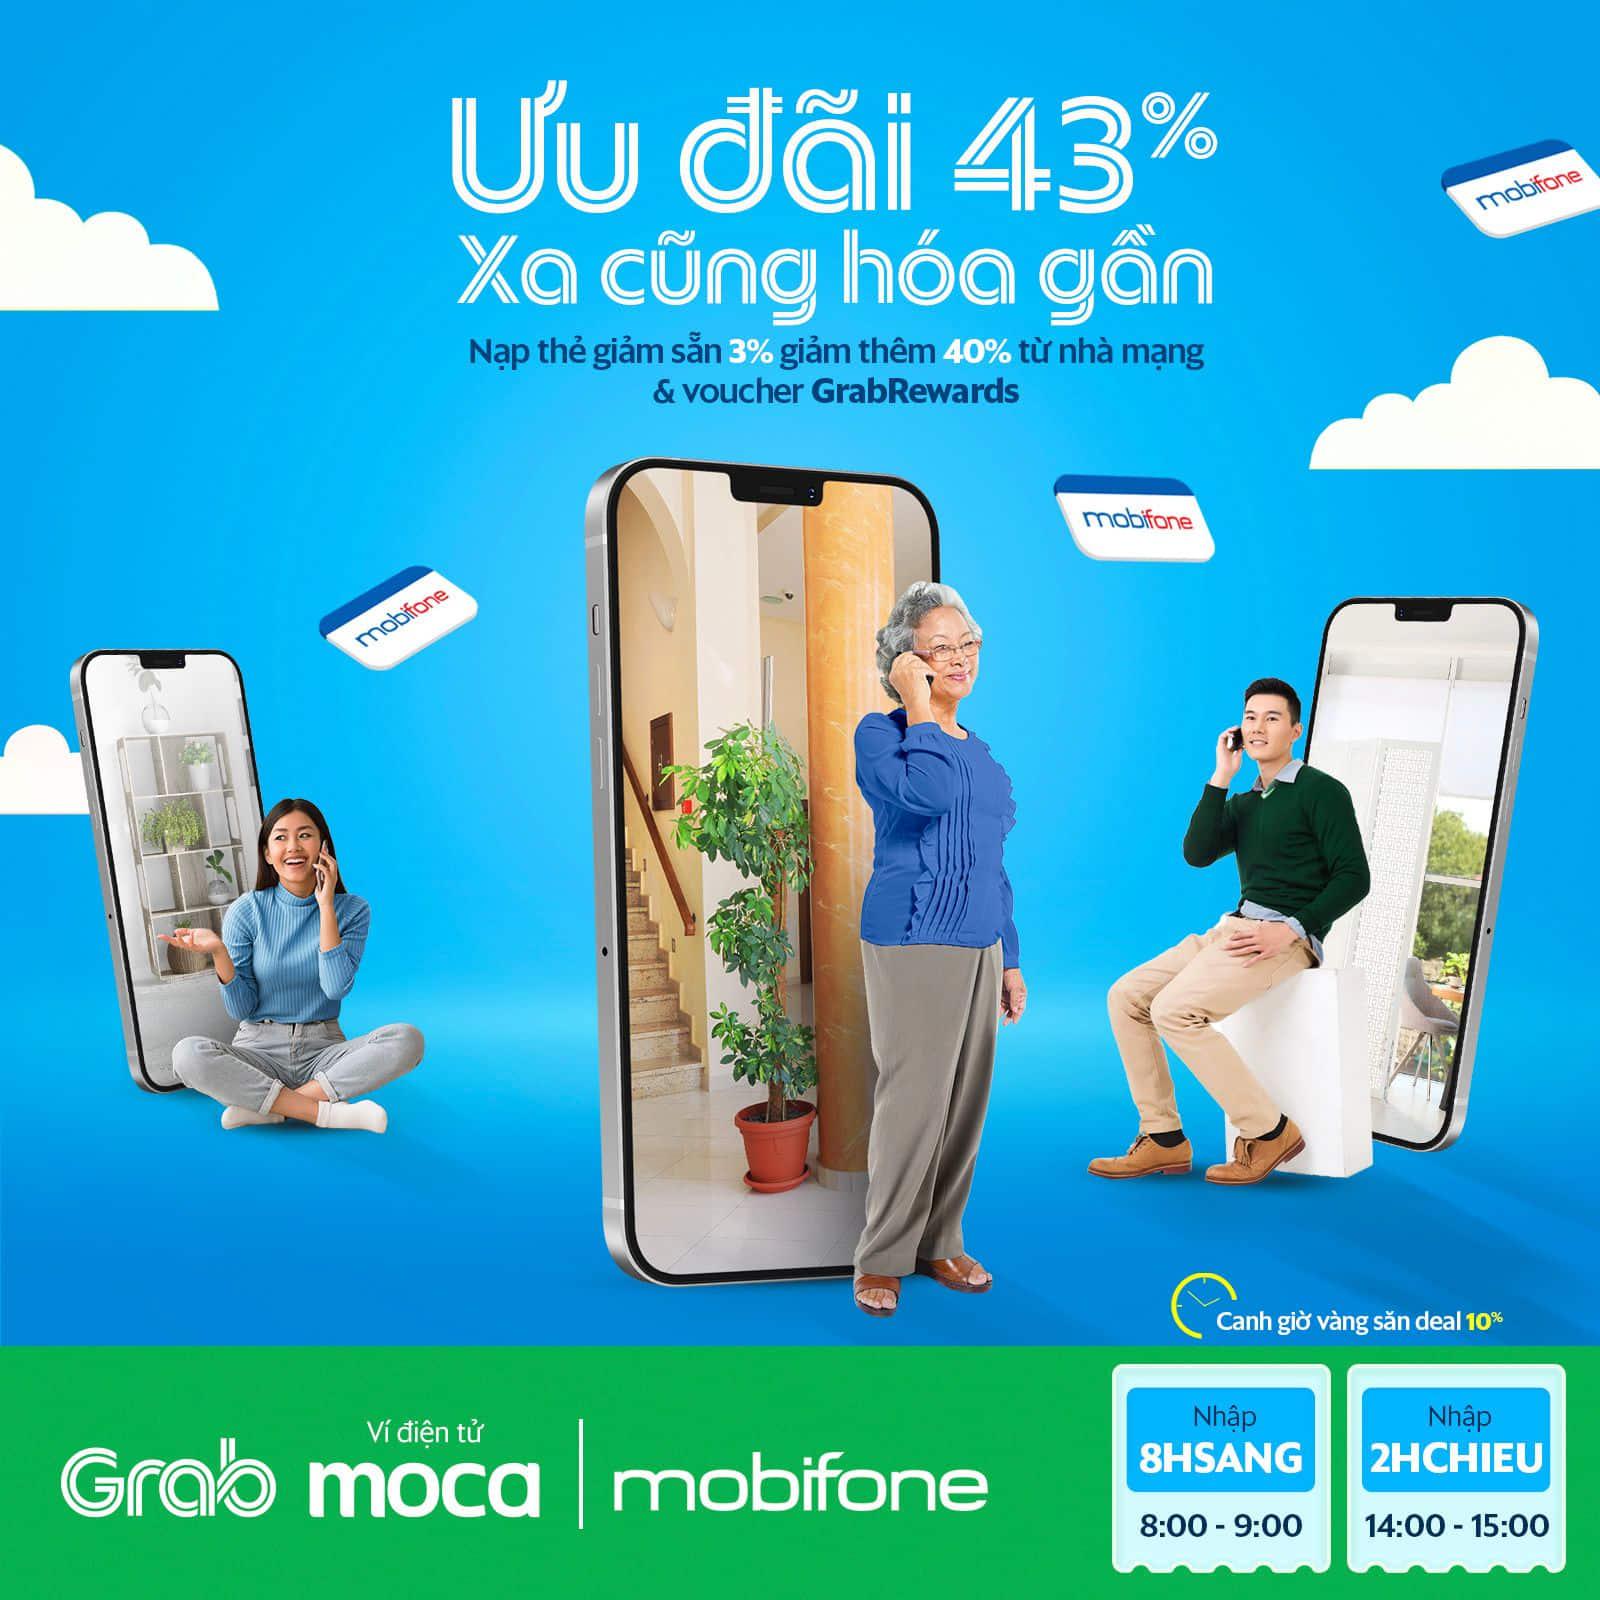 Ưu đãi 43% MobiFone